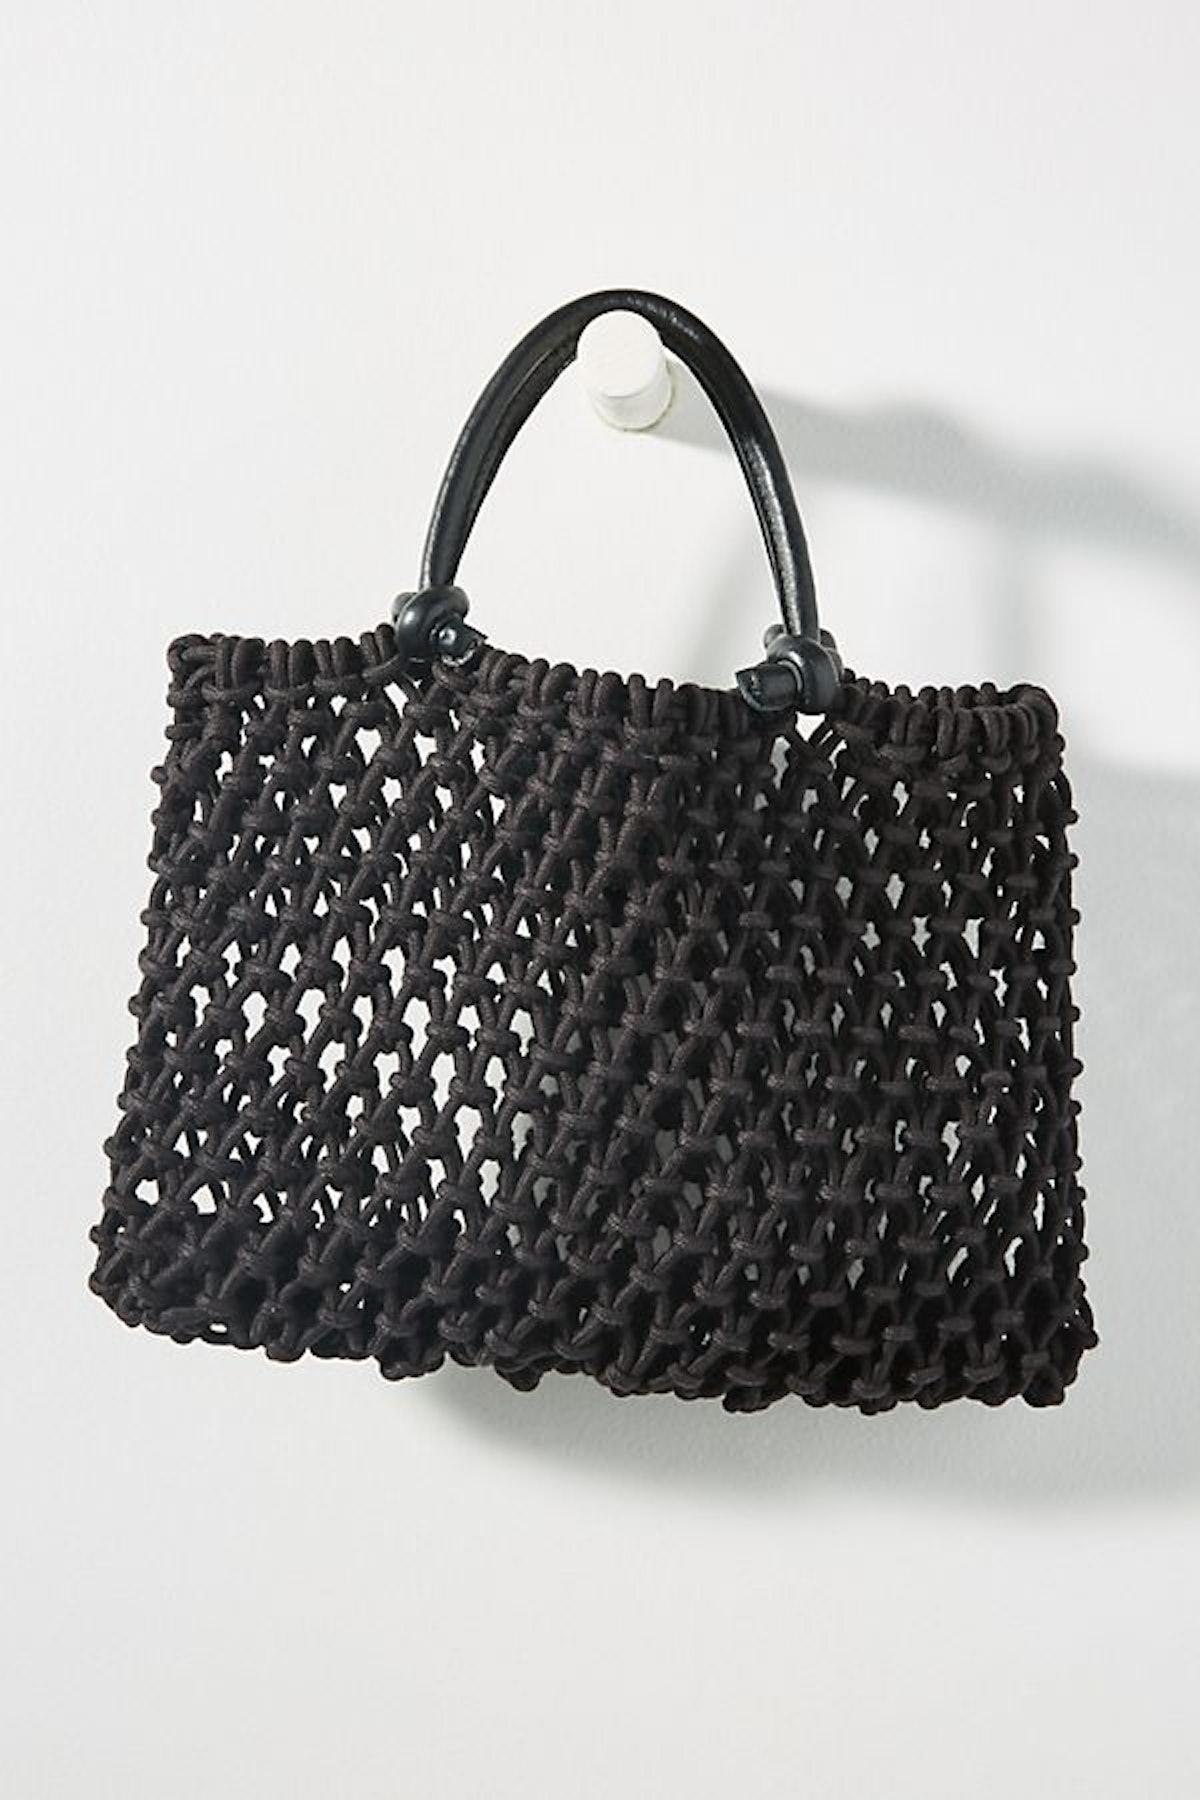 Clare V. Petite Sandy Tote Bag